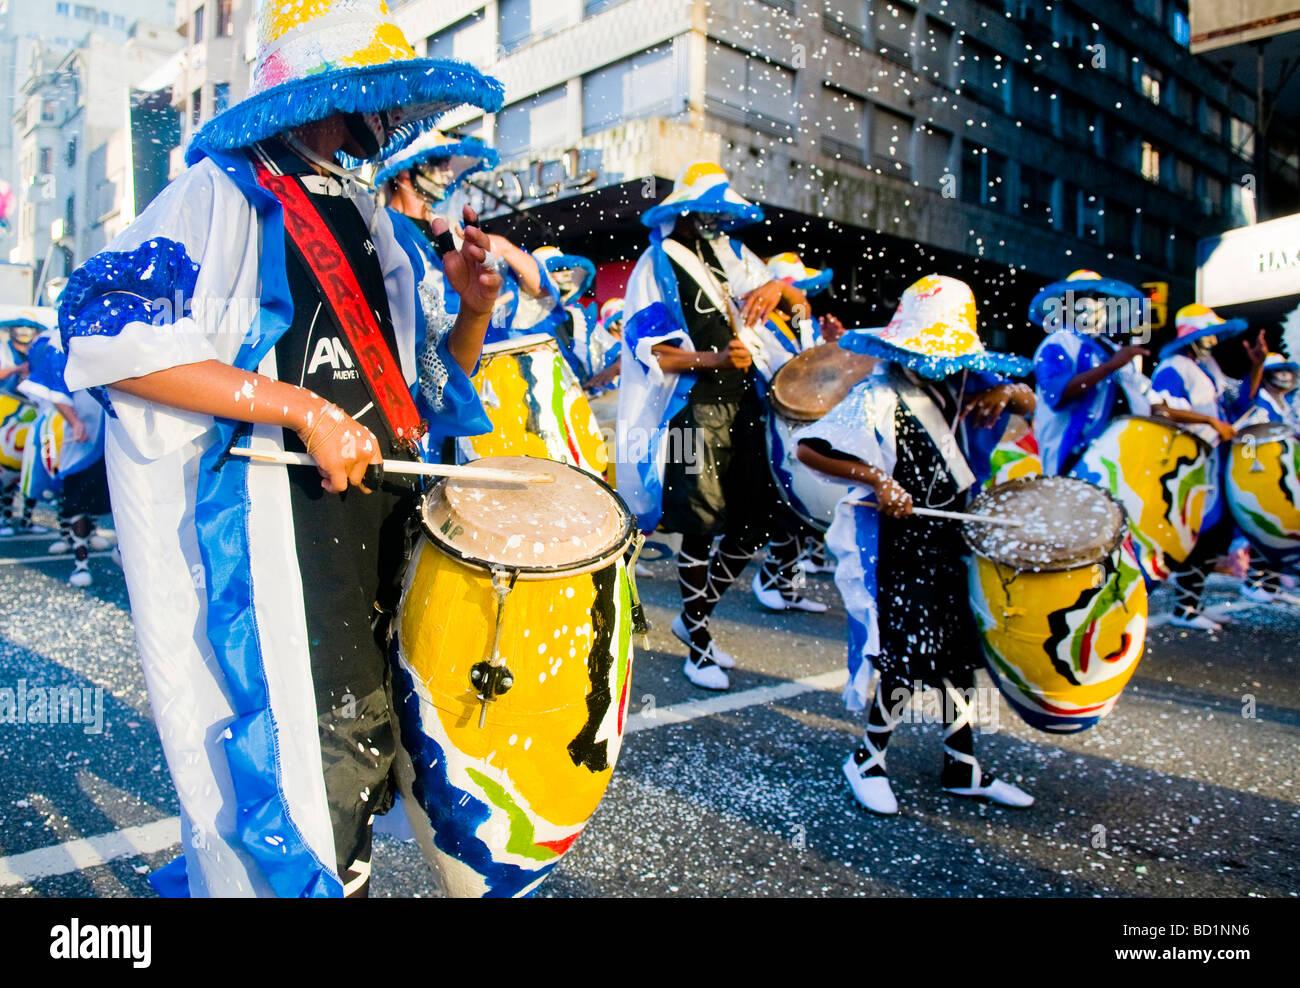 Le candombe tambours mars dans la rue de Montevideo Uruguay Photo Stock